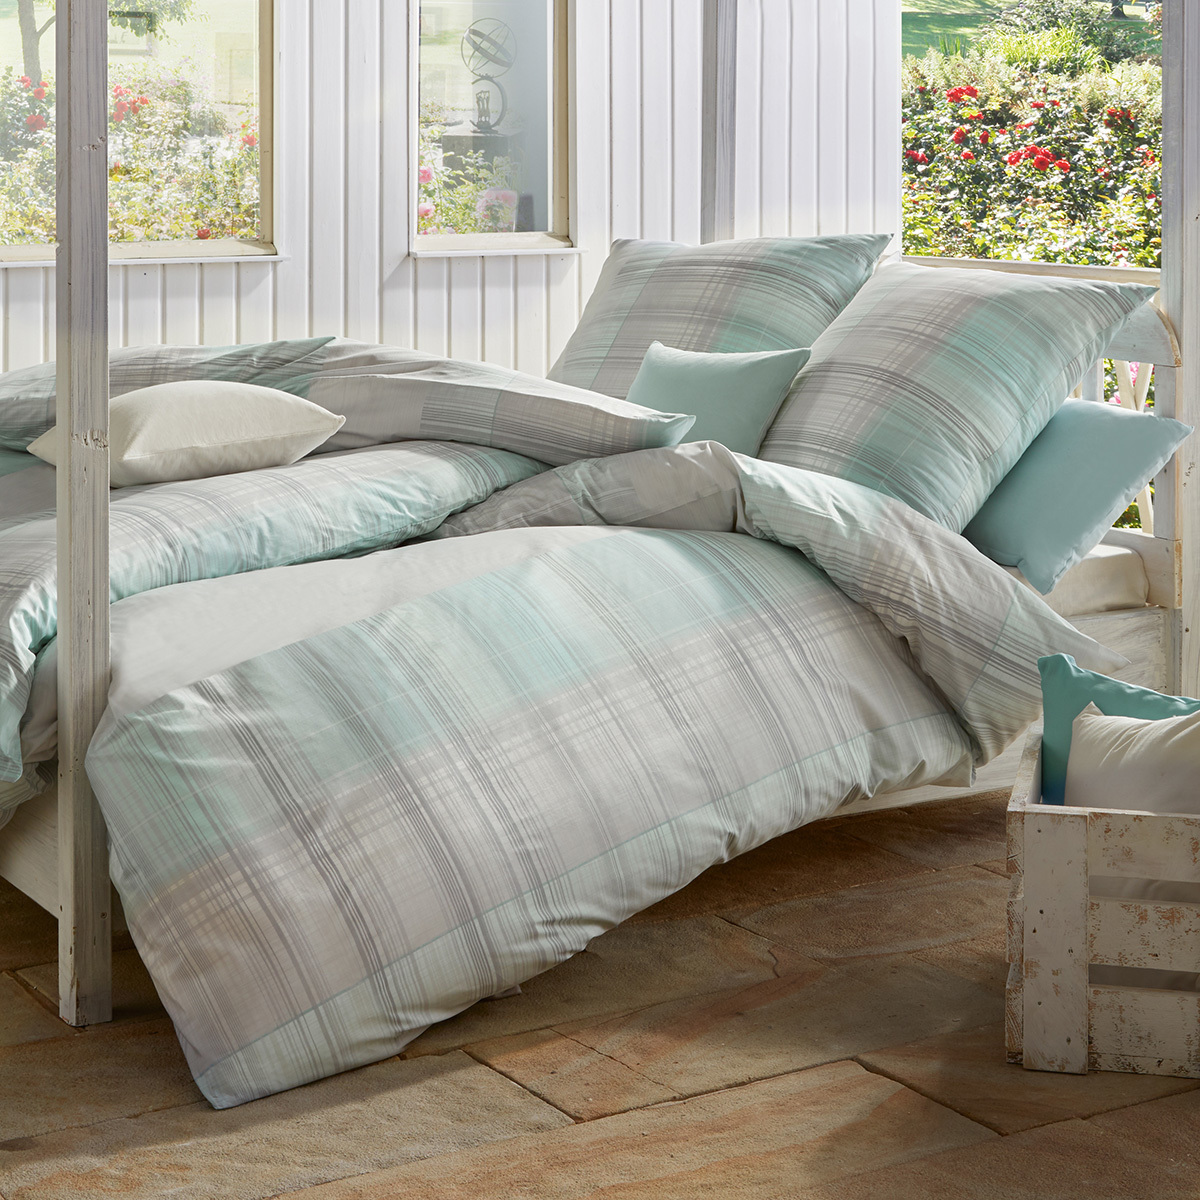 estella mako interlock jersey bettw sche 6290 560 t rkis. Black Bedroom Furniture Sets. Home Design Ideas